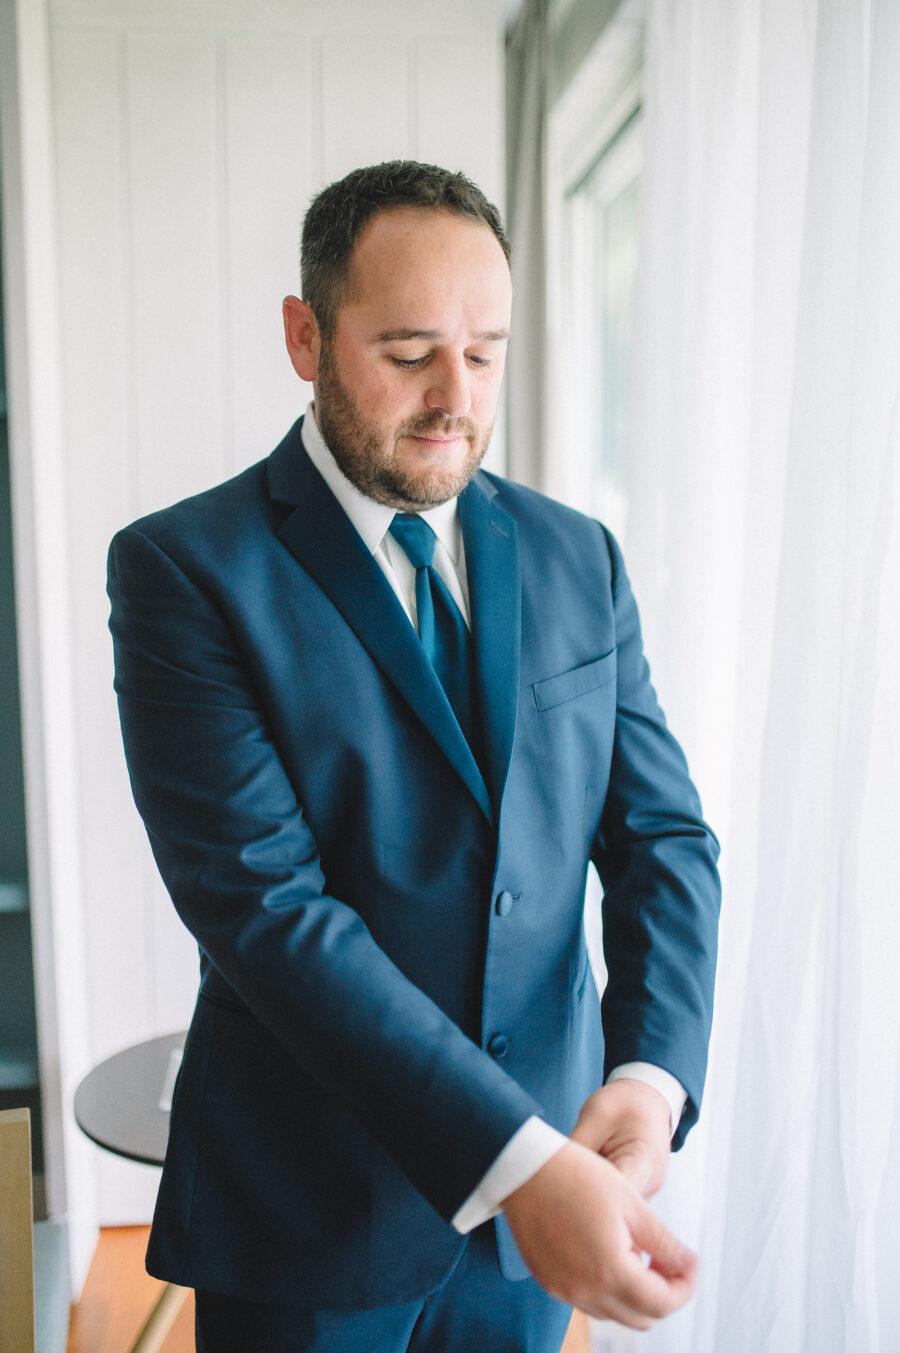 Navy blue groom's attire: Intimate Caribbean Wedding by Details Nashville featured on Nashville Bride Guide